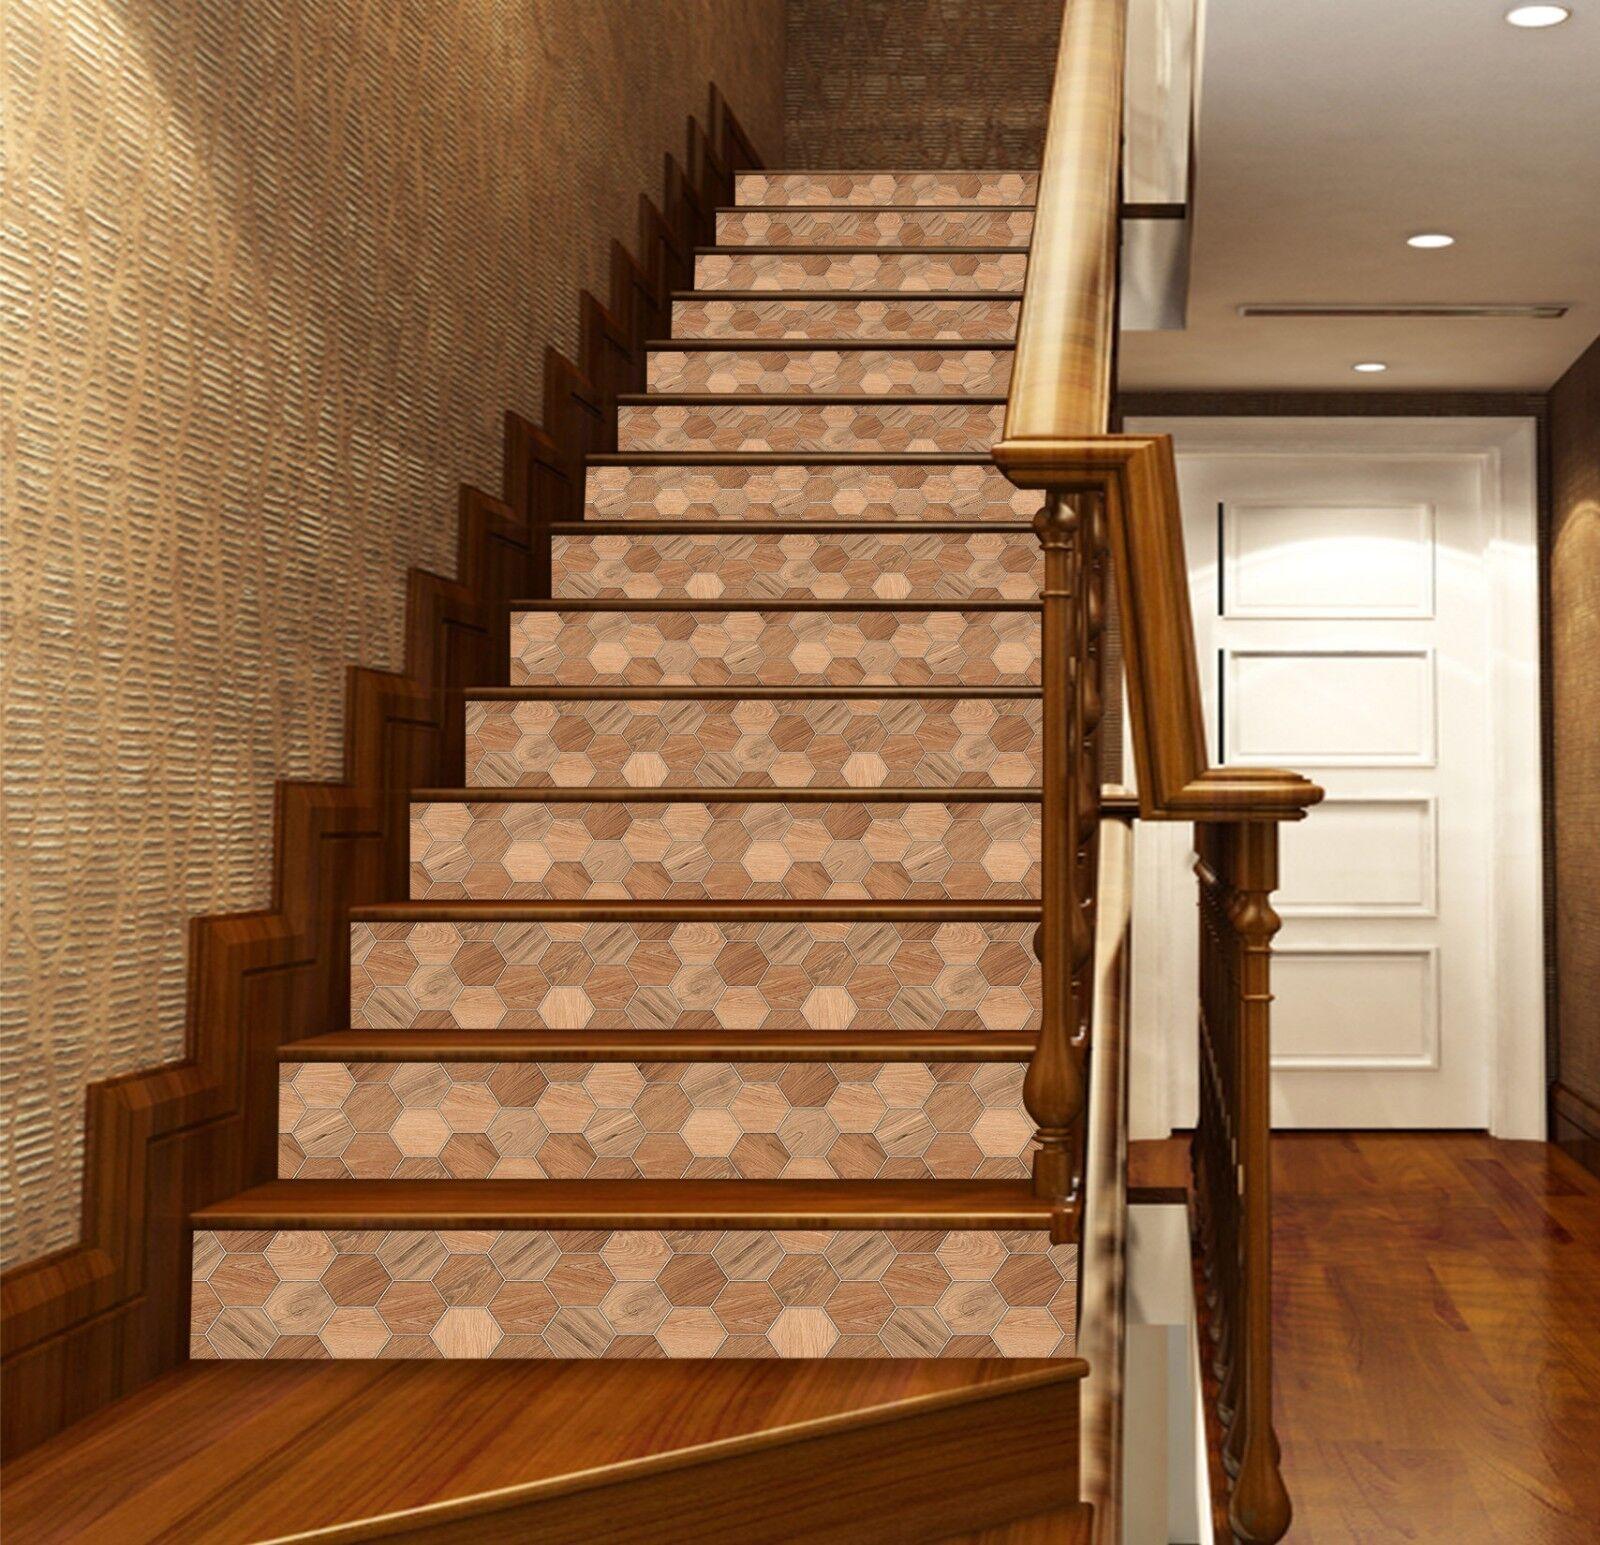 3D Retro Wood Texture 1 Tile Marble Stair Riser Decoration Mural Vinyl Wallpaper